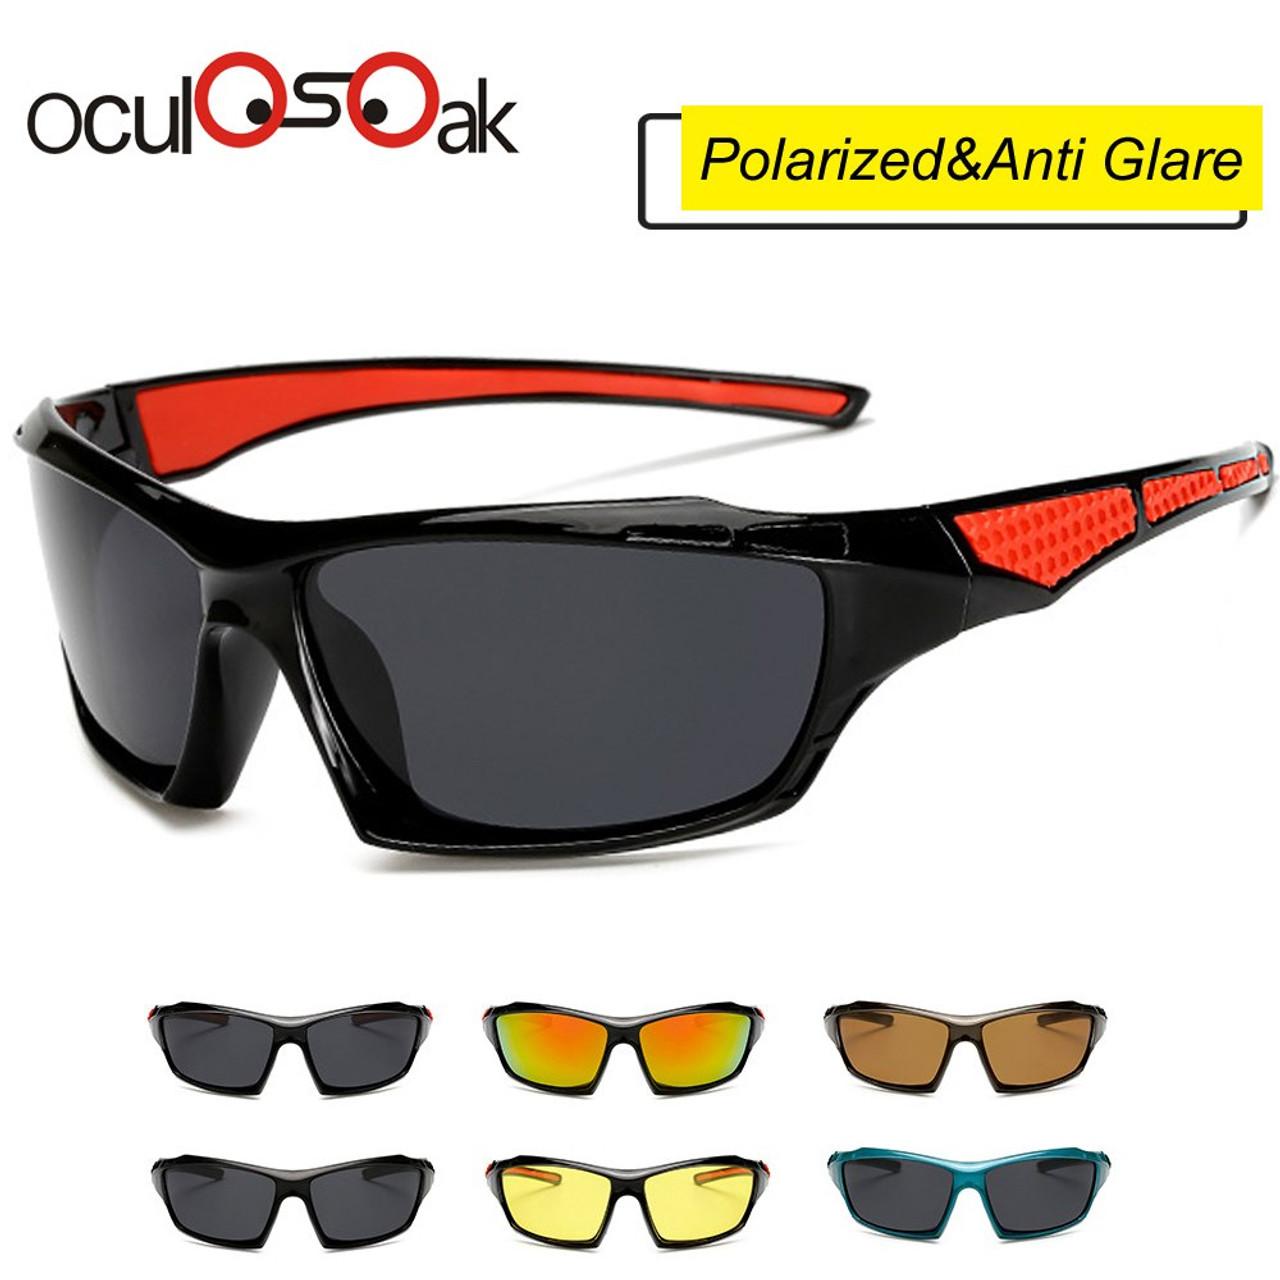 c92a86ec8 Brand Classic Men's Polarized Sunglasses Men Driving Sun Glasses Vintage  Plastic Frame Goggle Male Eyewear UV400 ...